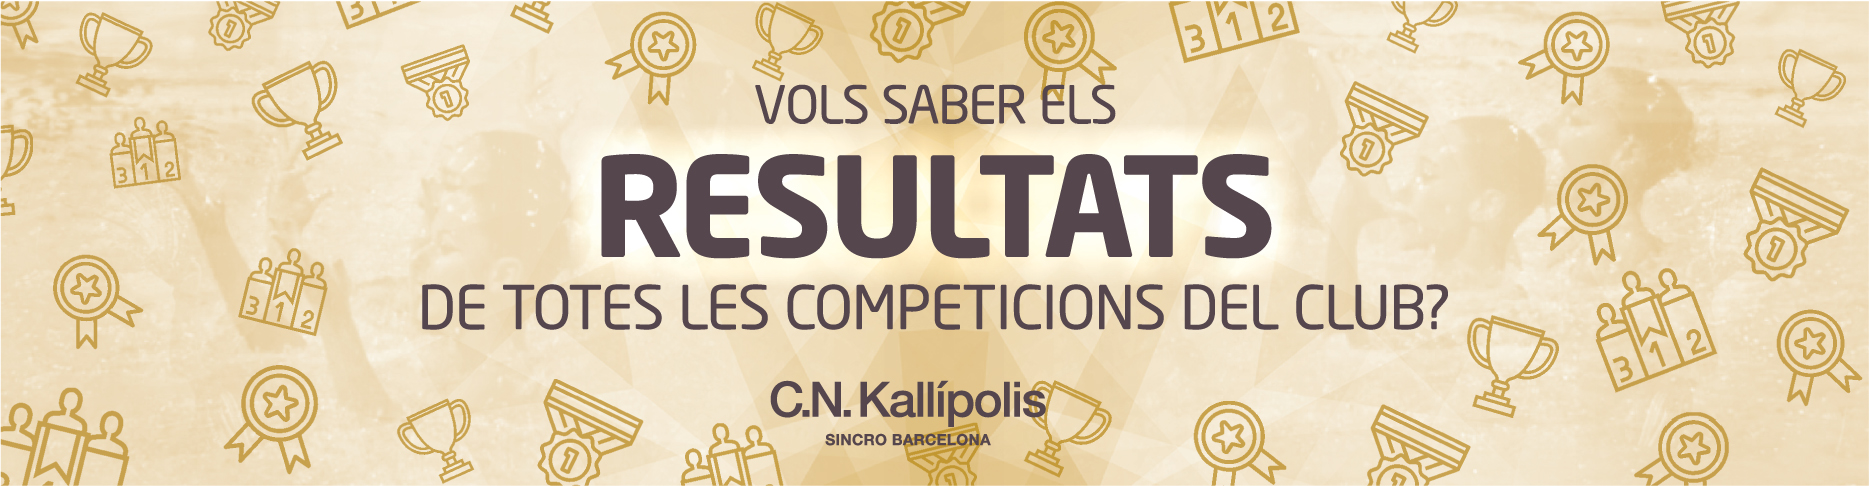 Kallipolis_Resultats